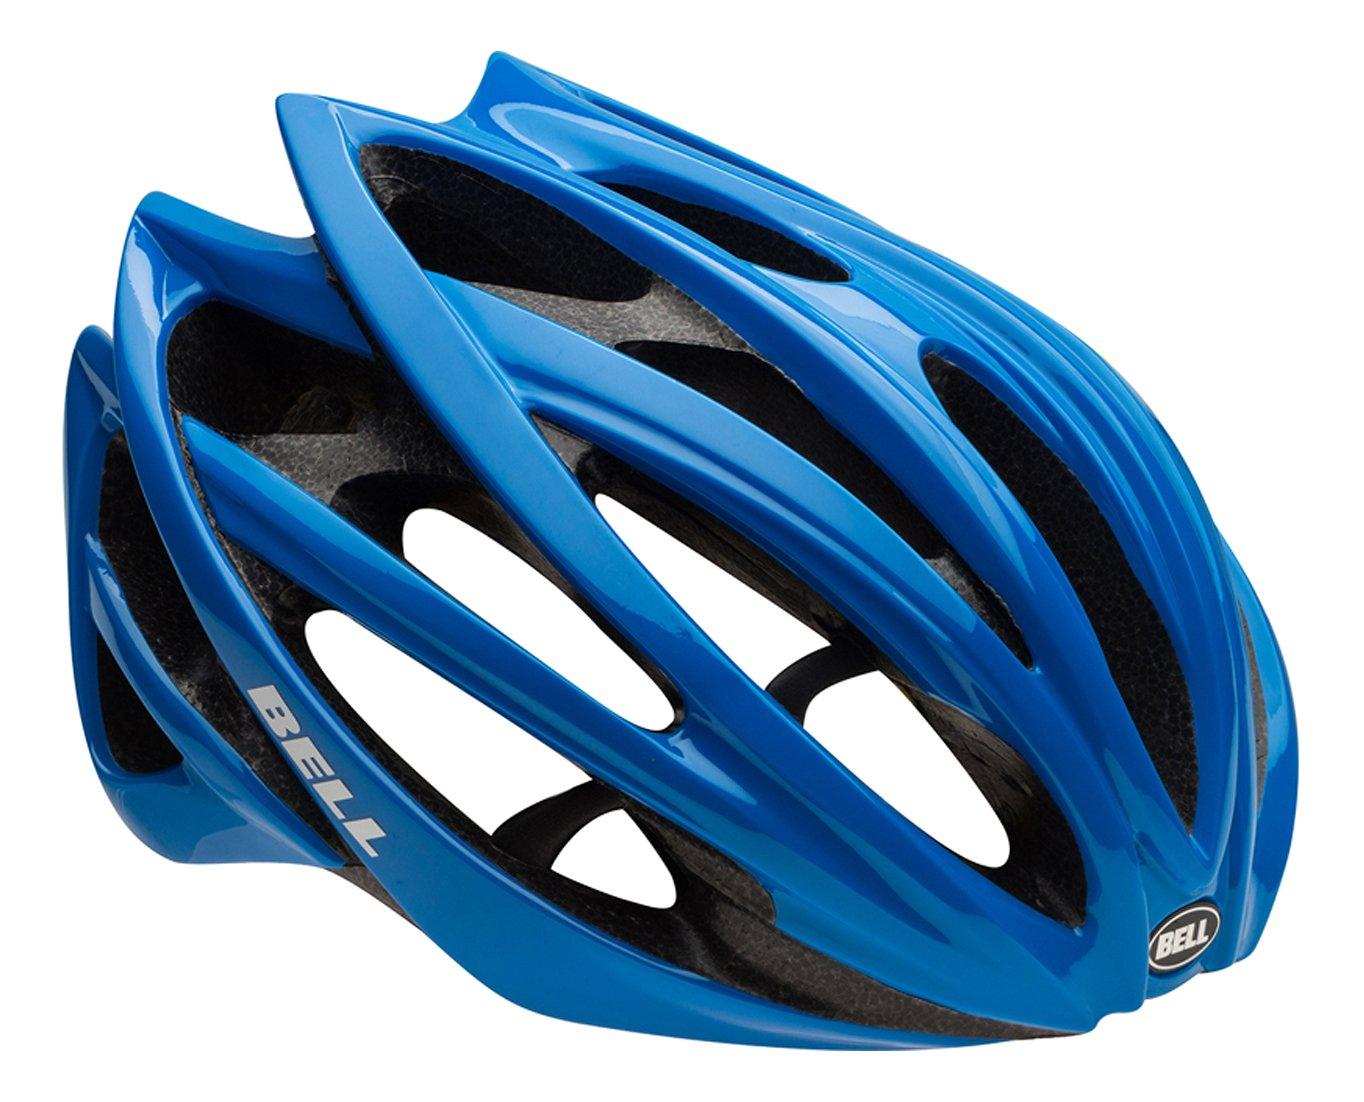 Bell Gage MIPS Equipped Race Helmet 2016